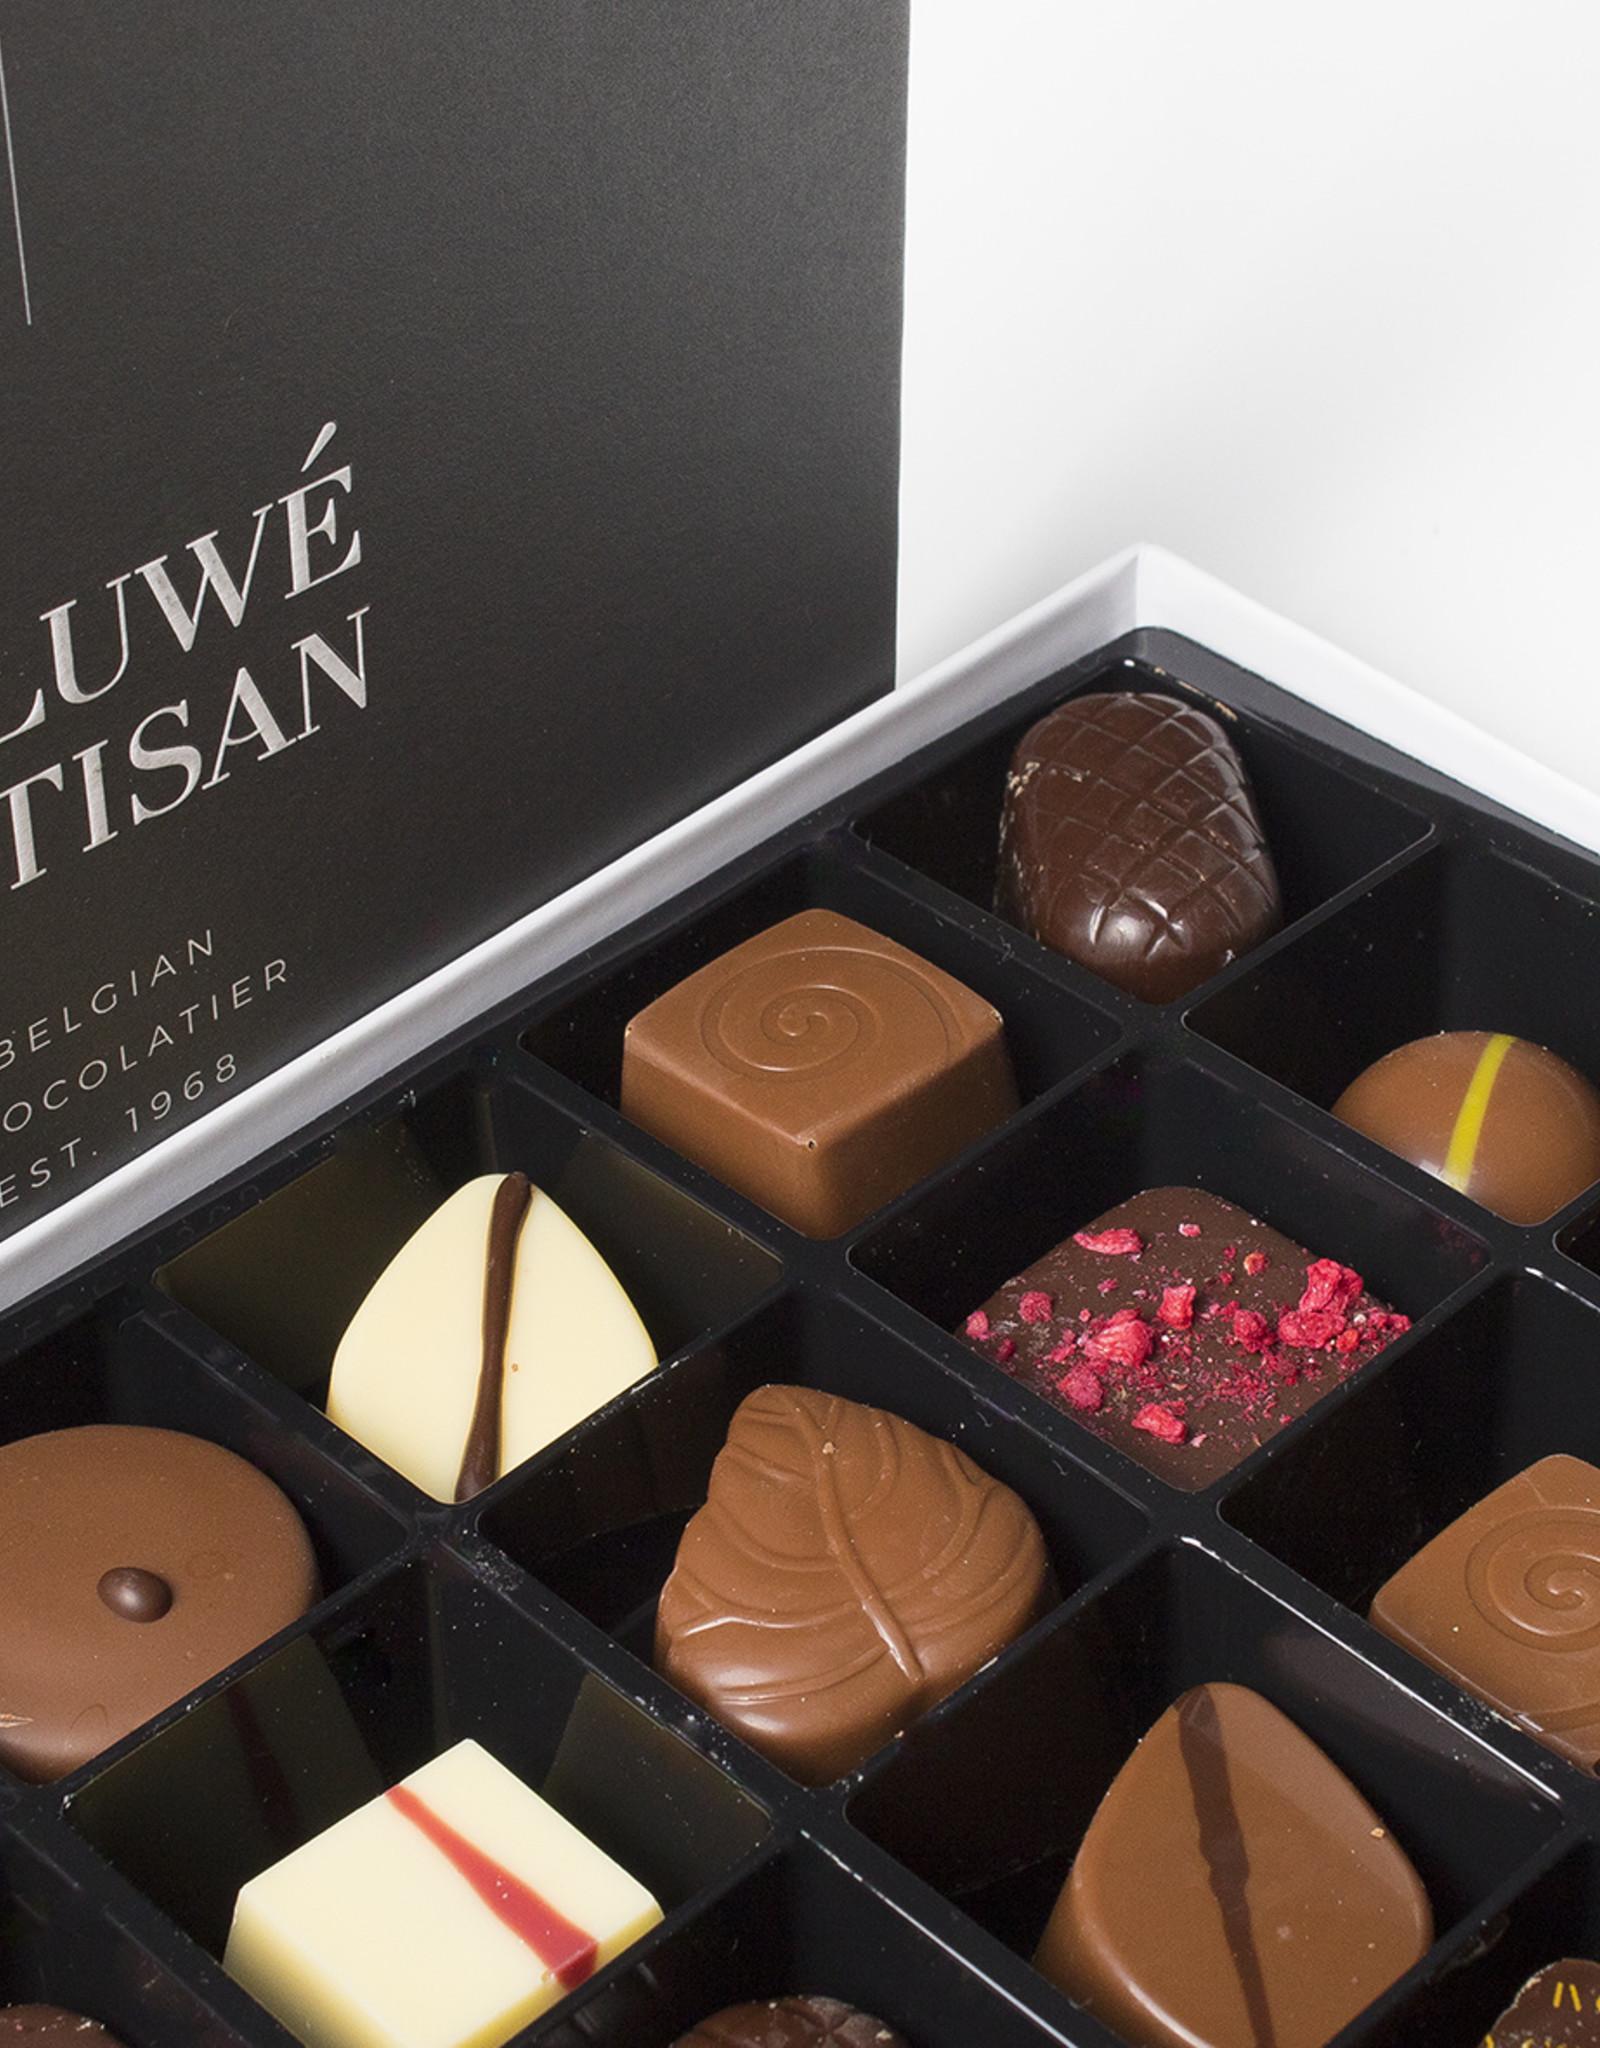 Caluwe Artisan Assortiment de chocolats Belges rempli mix.